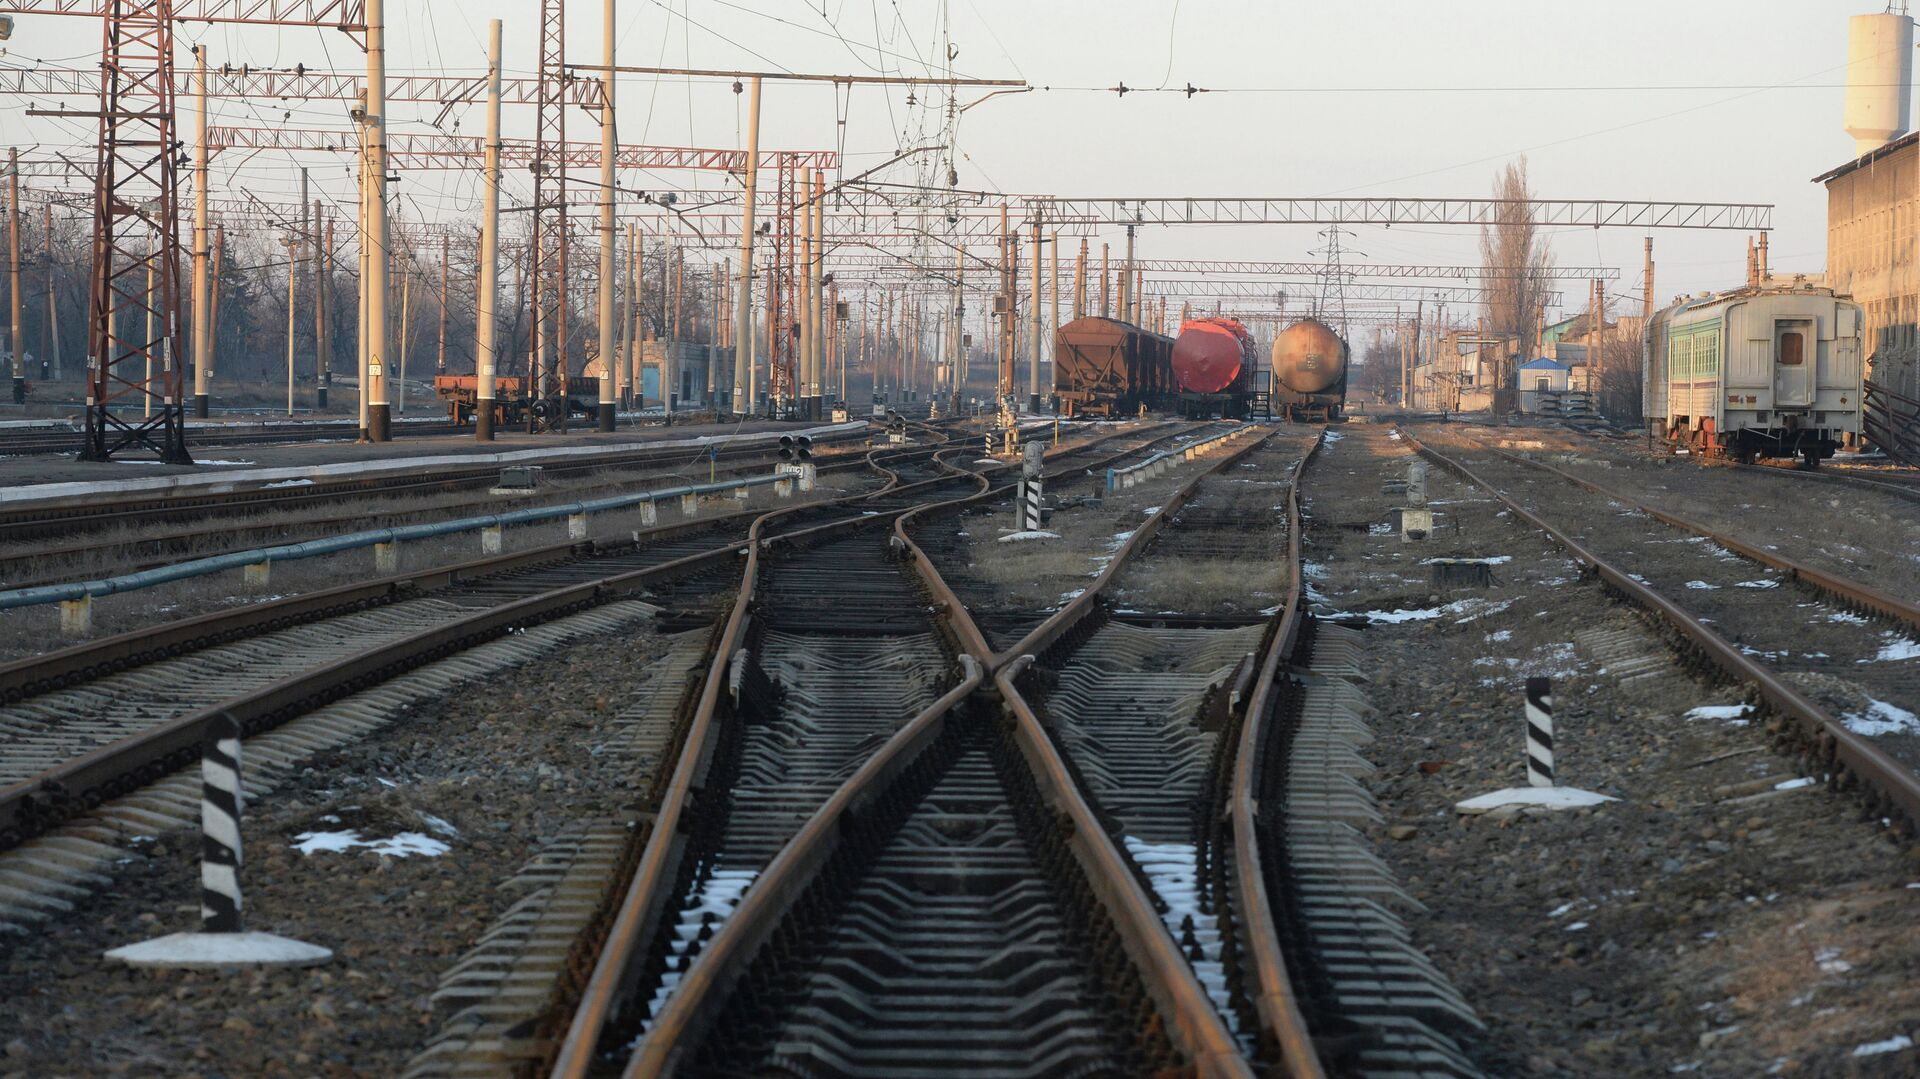 Ferrovia - Sputnik Italia, 1920, 07.06.2021